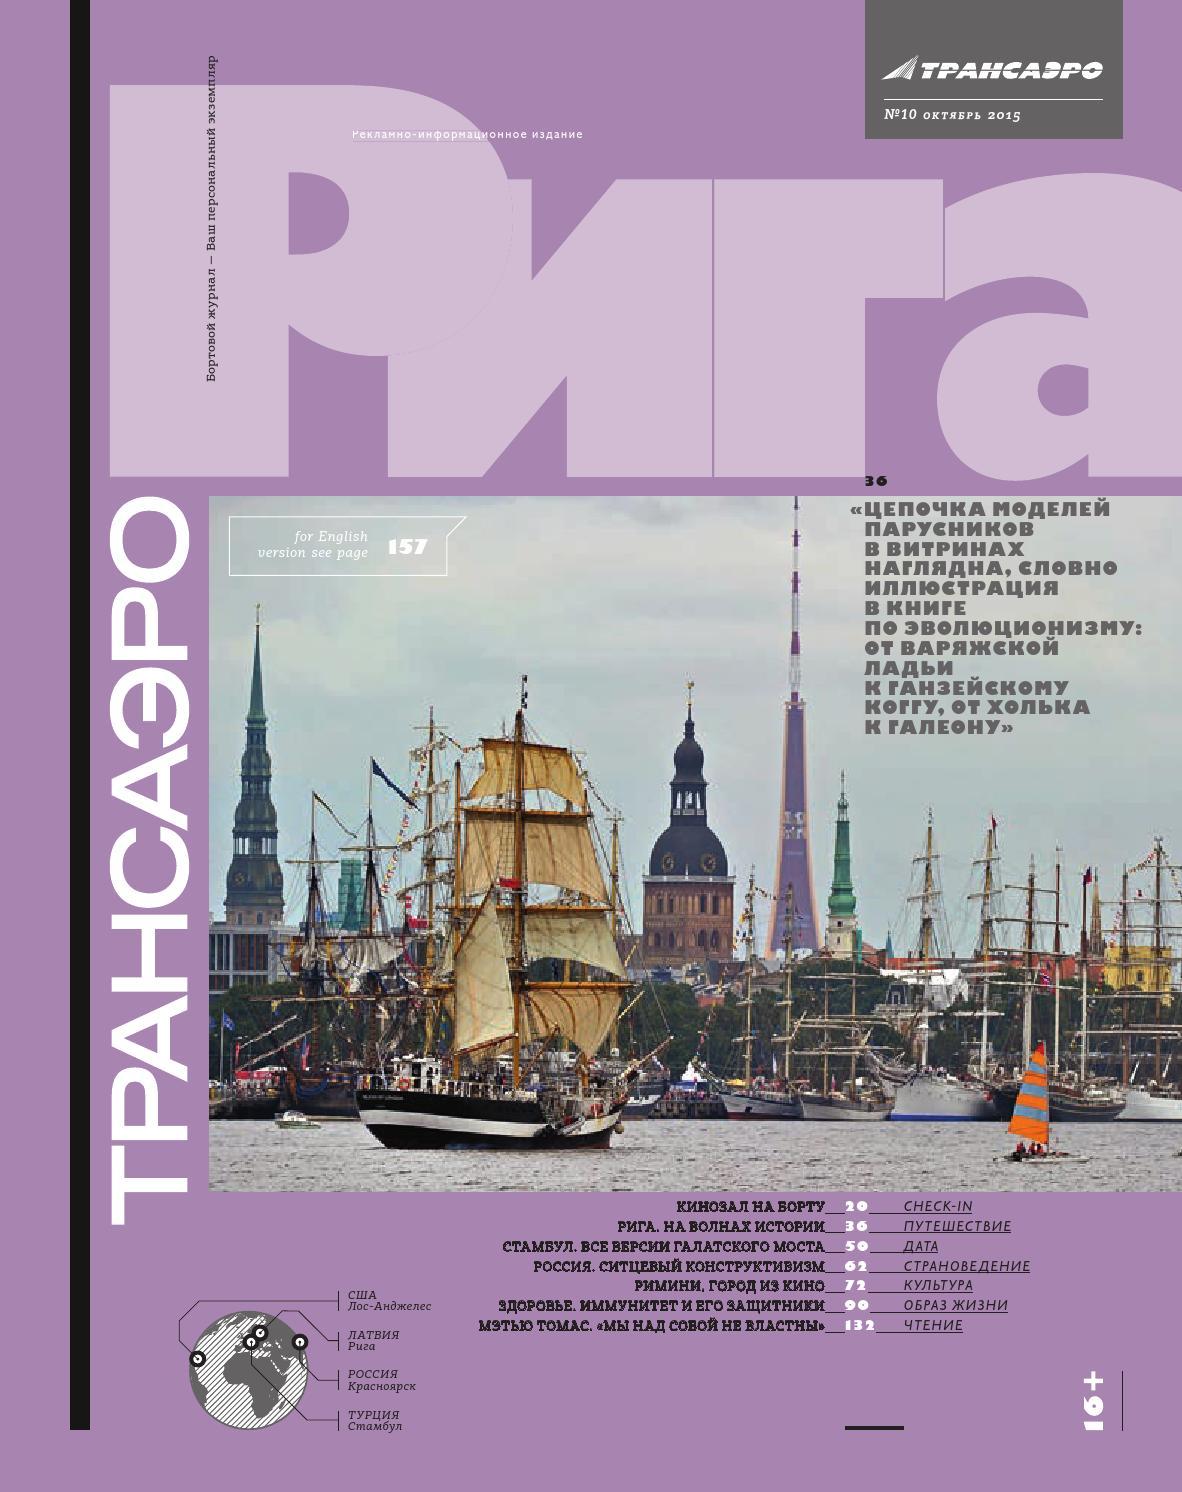 Transaero Magazine  10 2015 by TA Magazine - issuu d681c5c6f5e